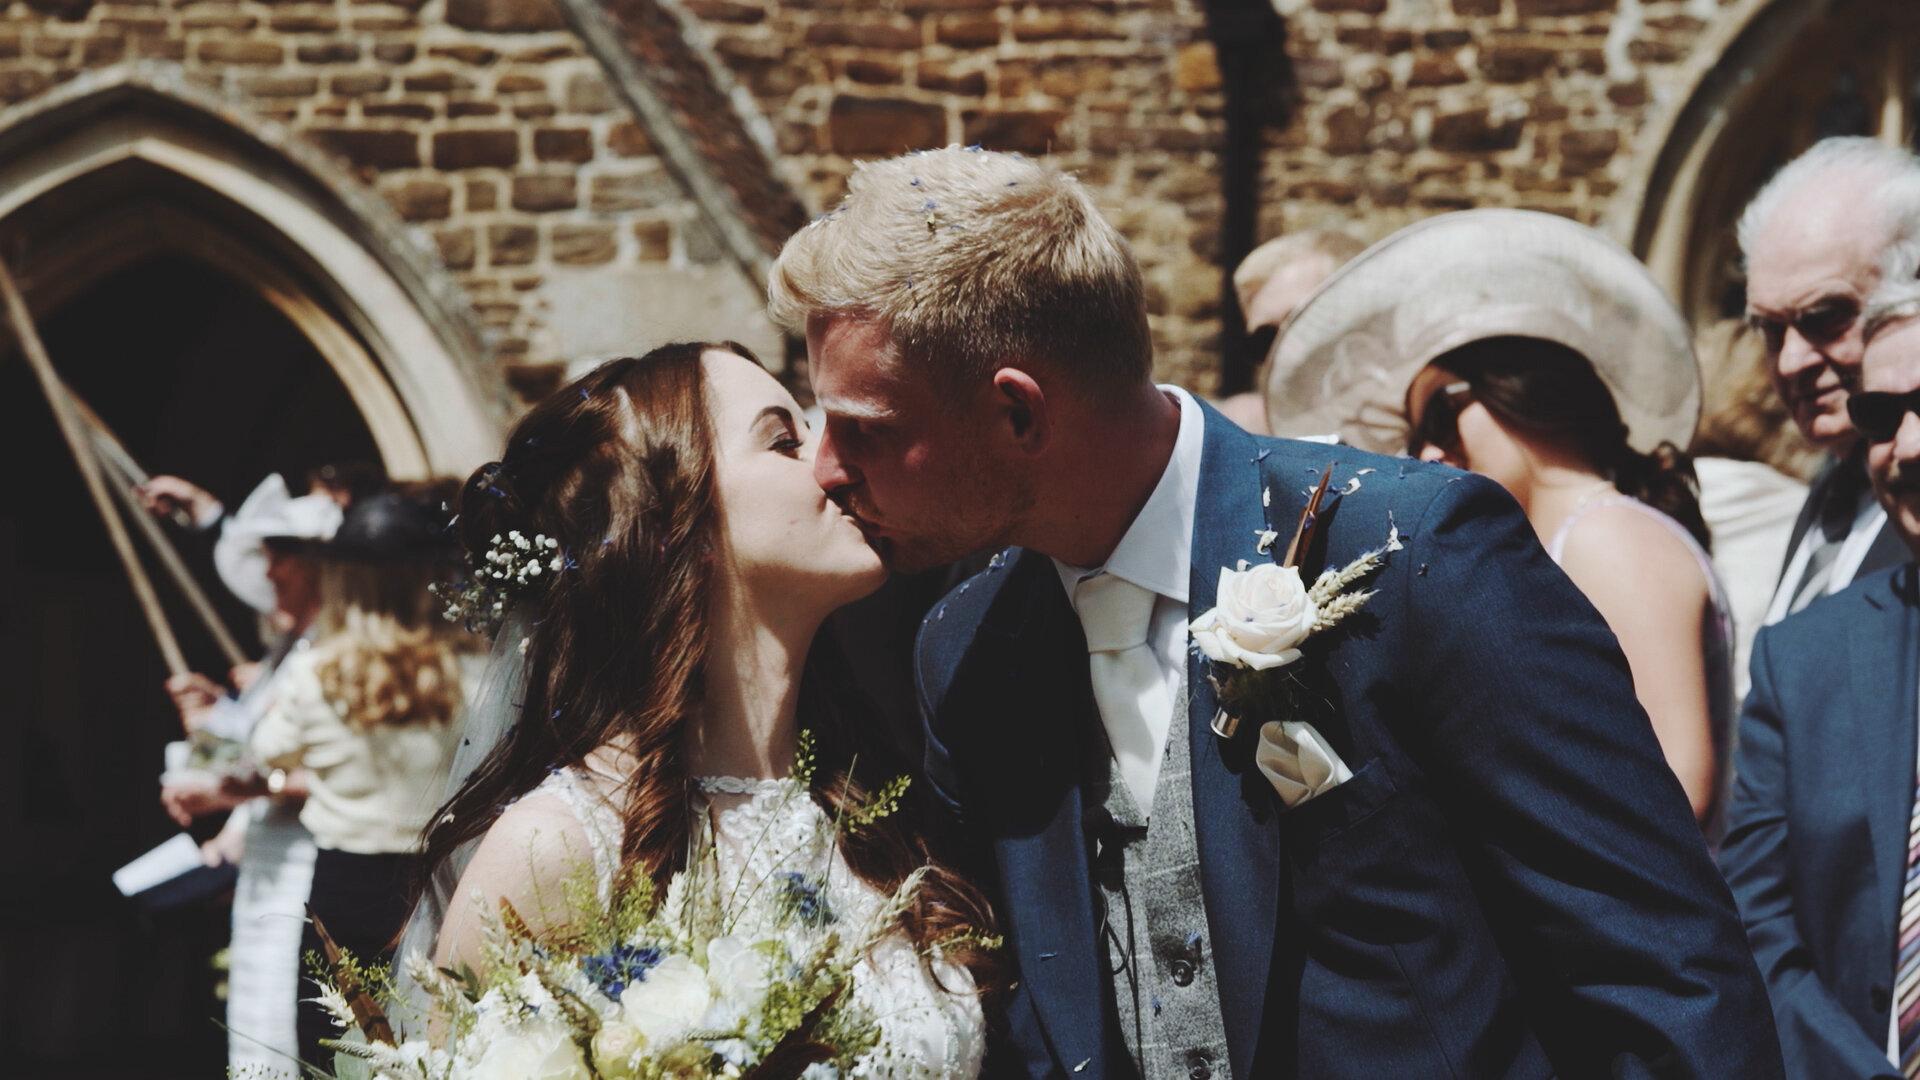 Rachel & Sam - Stills - Context Weddings45.jpg